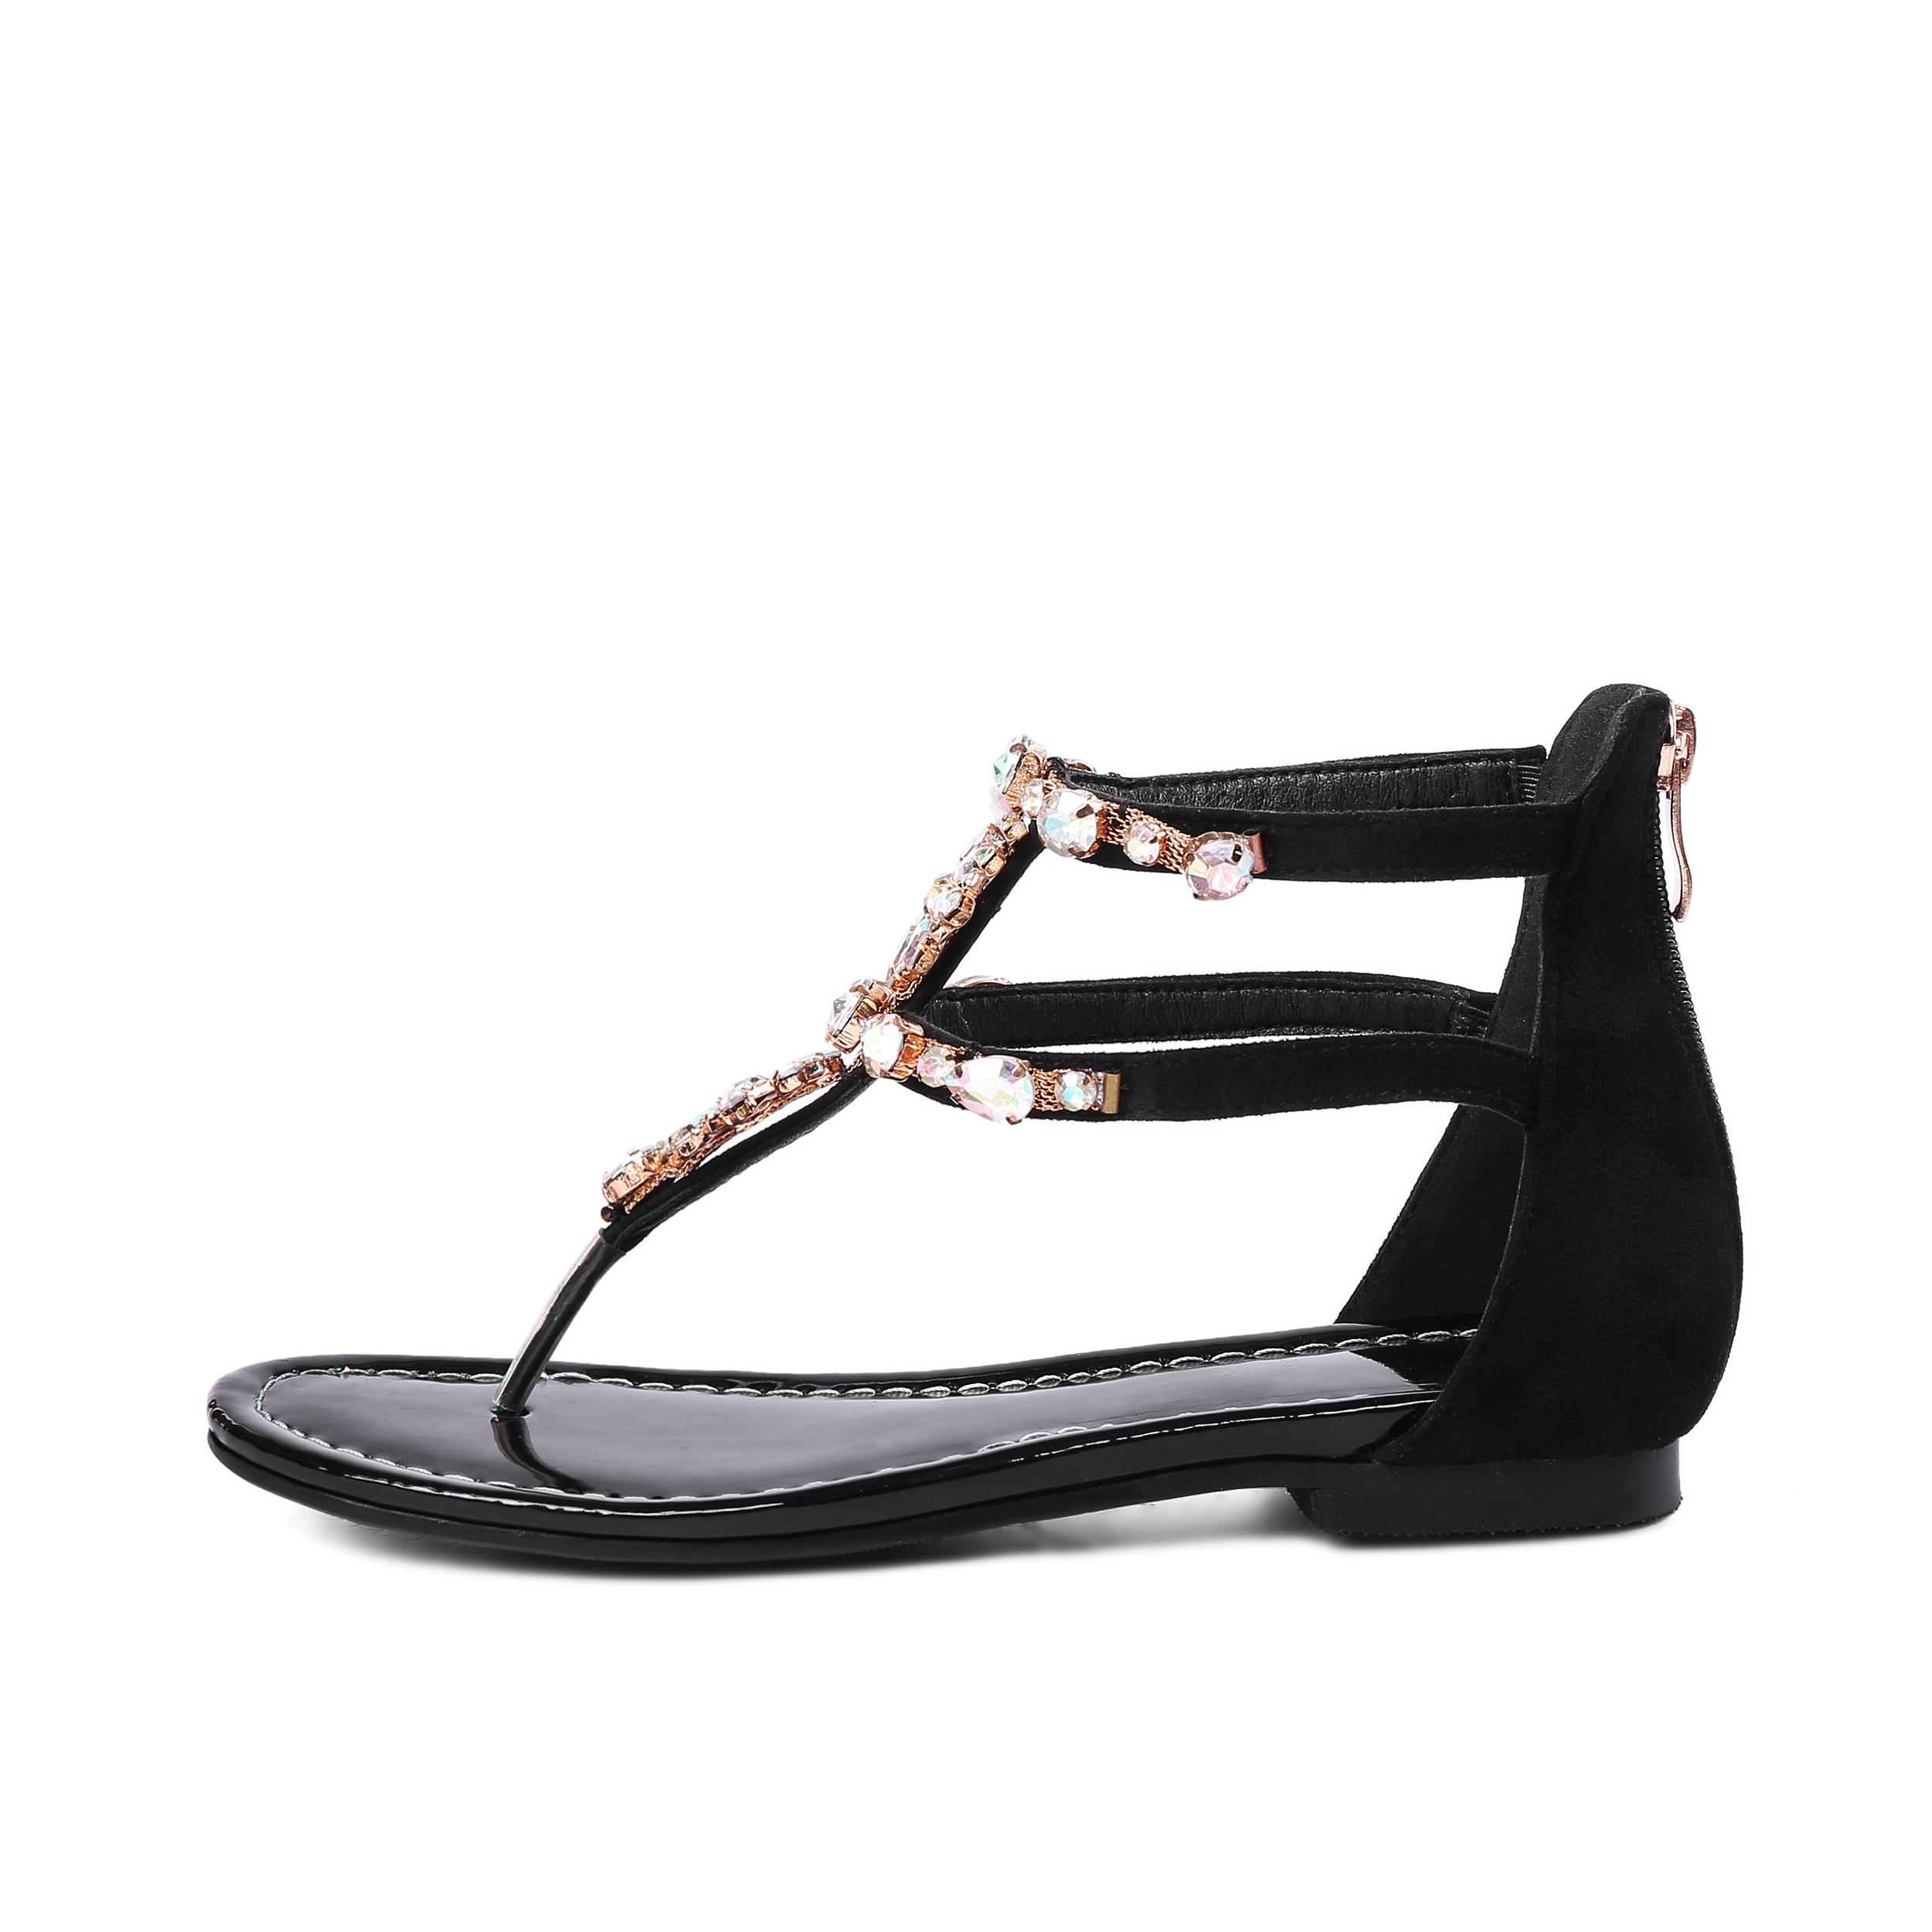 54afafecb11c7 US  48 - 2018 summer new style flip-flops crystal rhinestone flowers cover  heels sandals shoes woman ladies - www.ardenfurtado.com